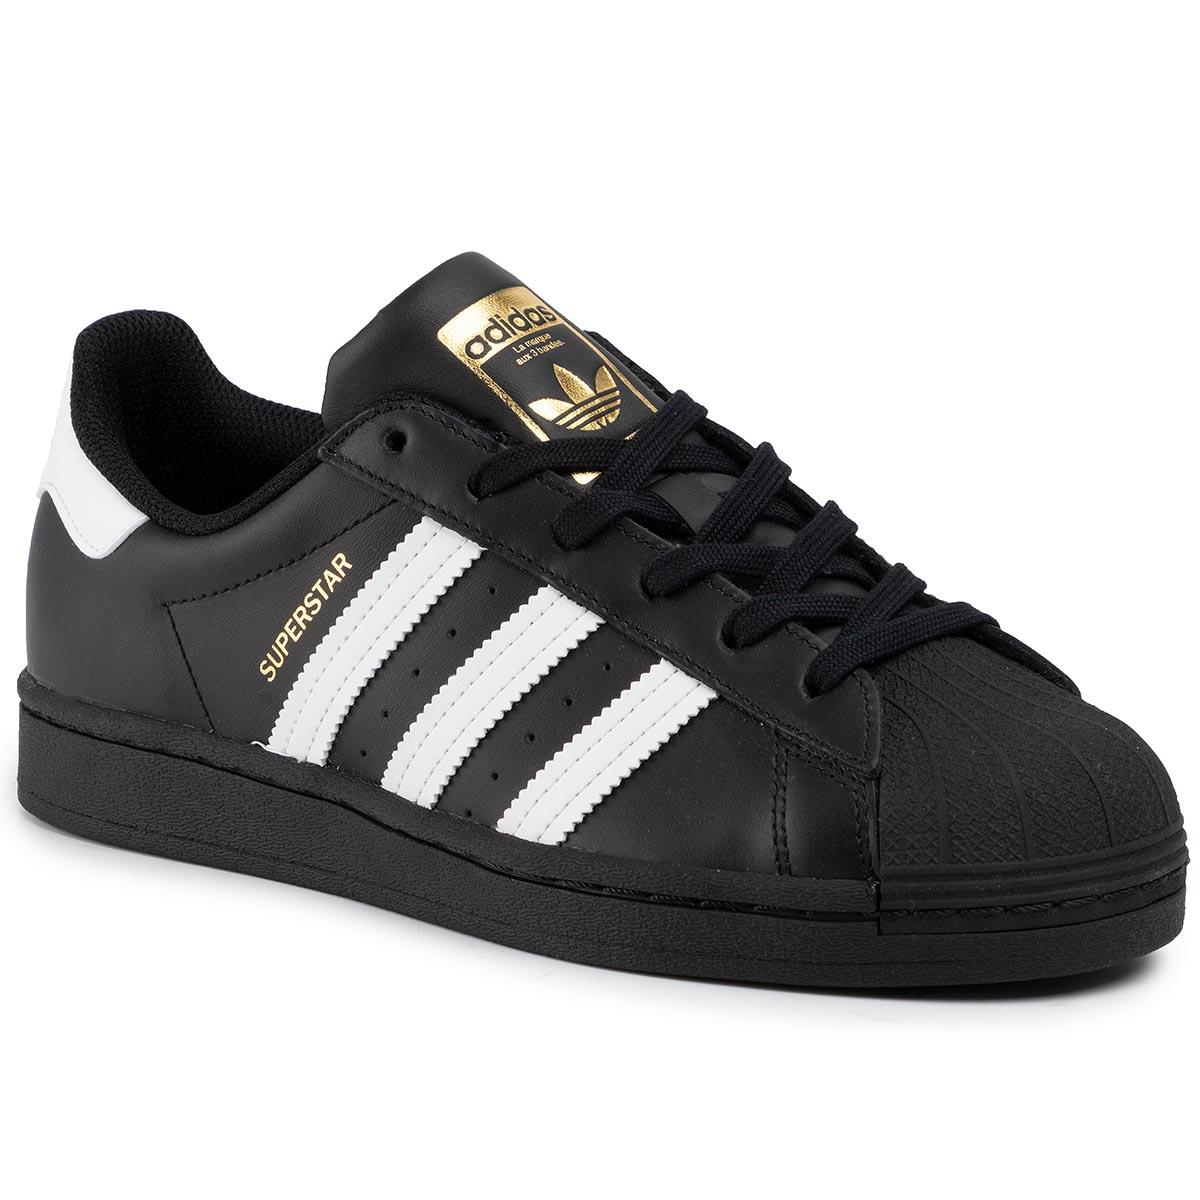 Topánky adidas - Superstar EG4959 Cblack/Ftwwht/Cblack